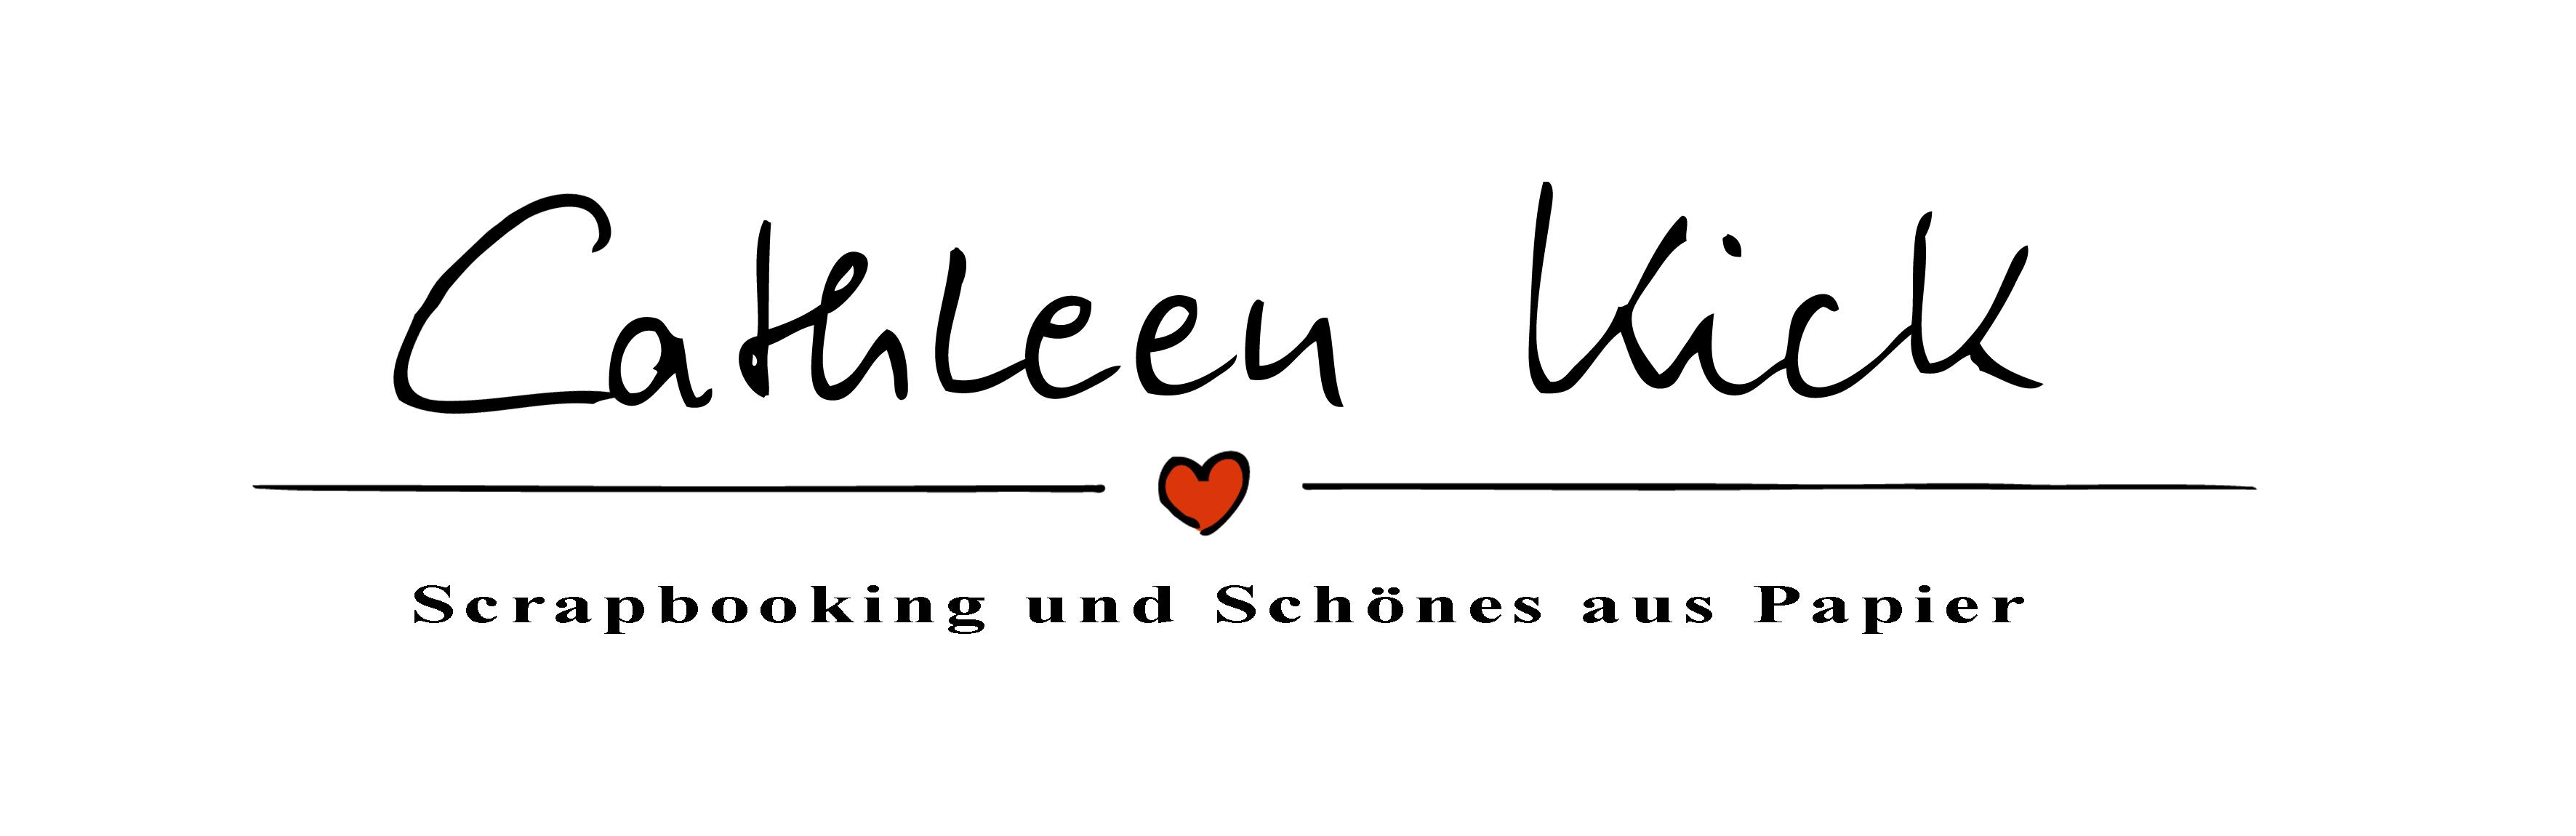 Cathleen Kick-Logo